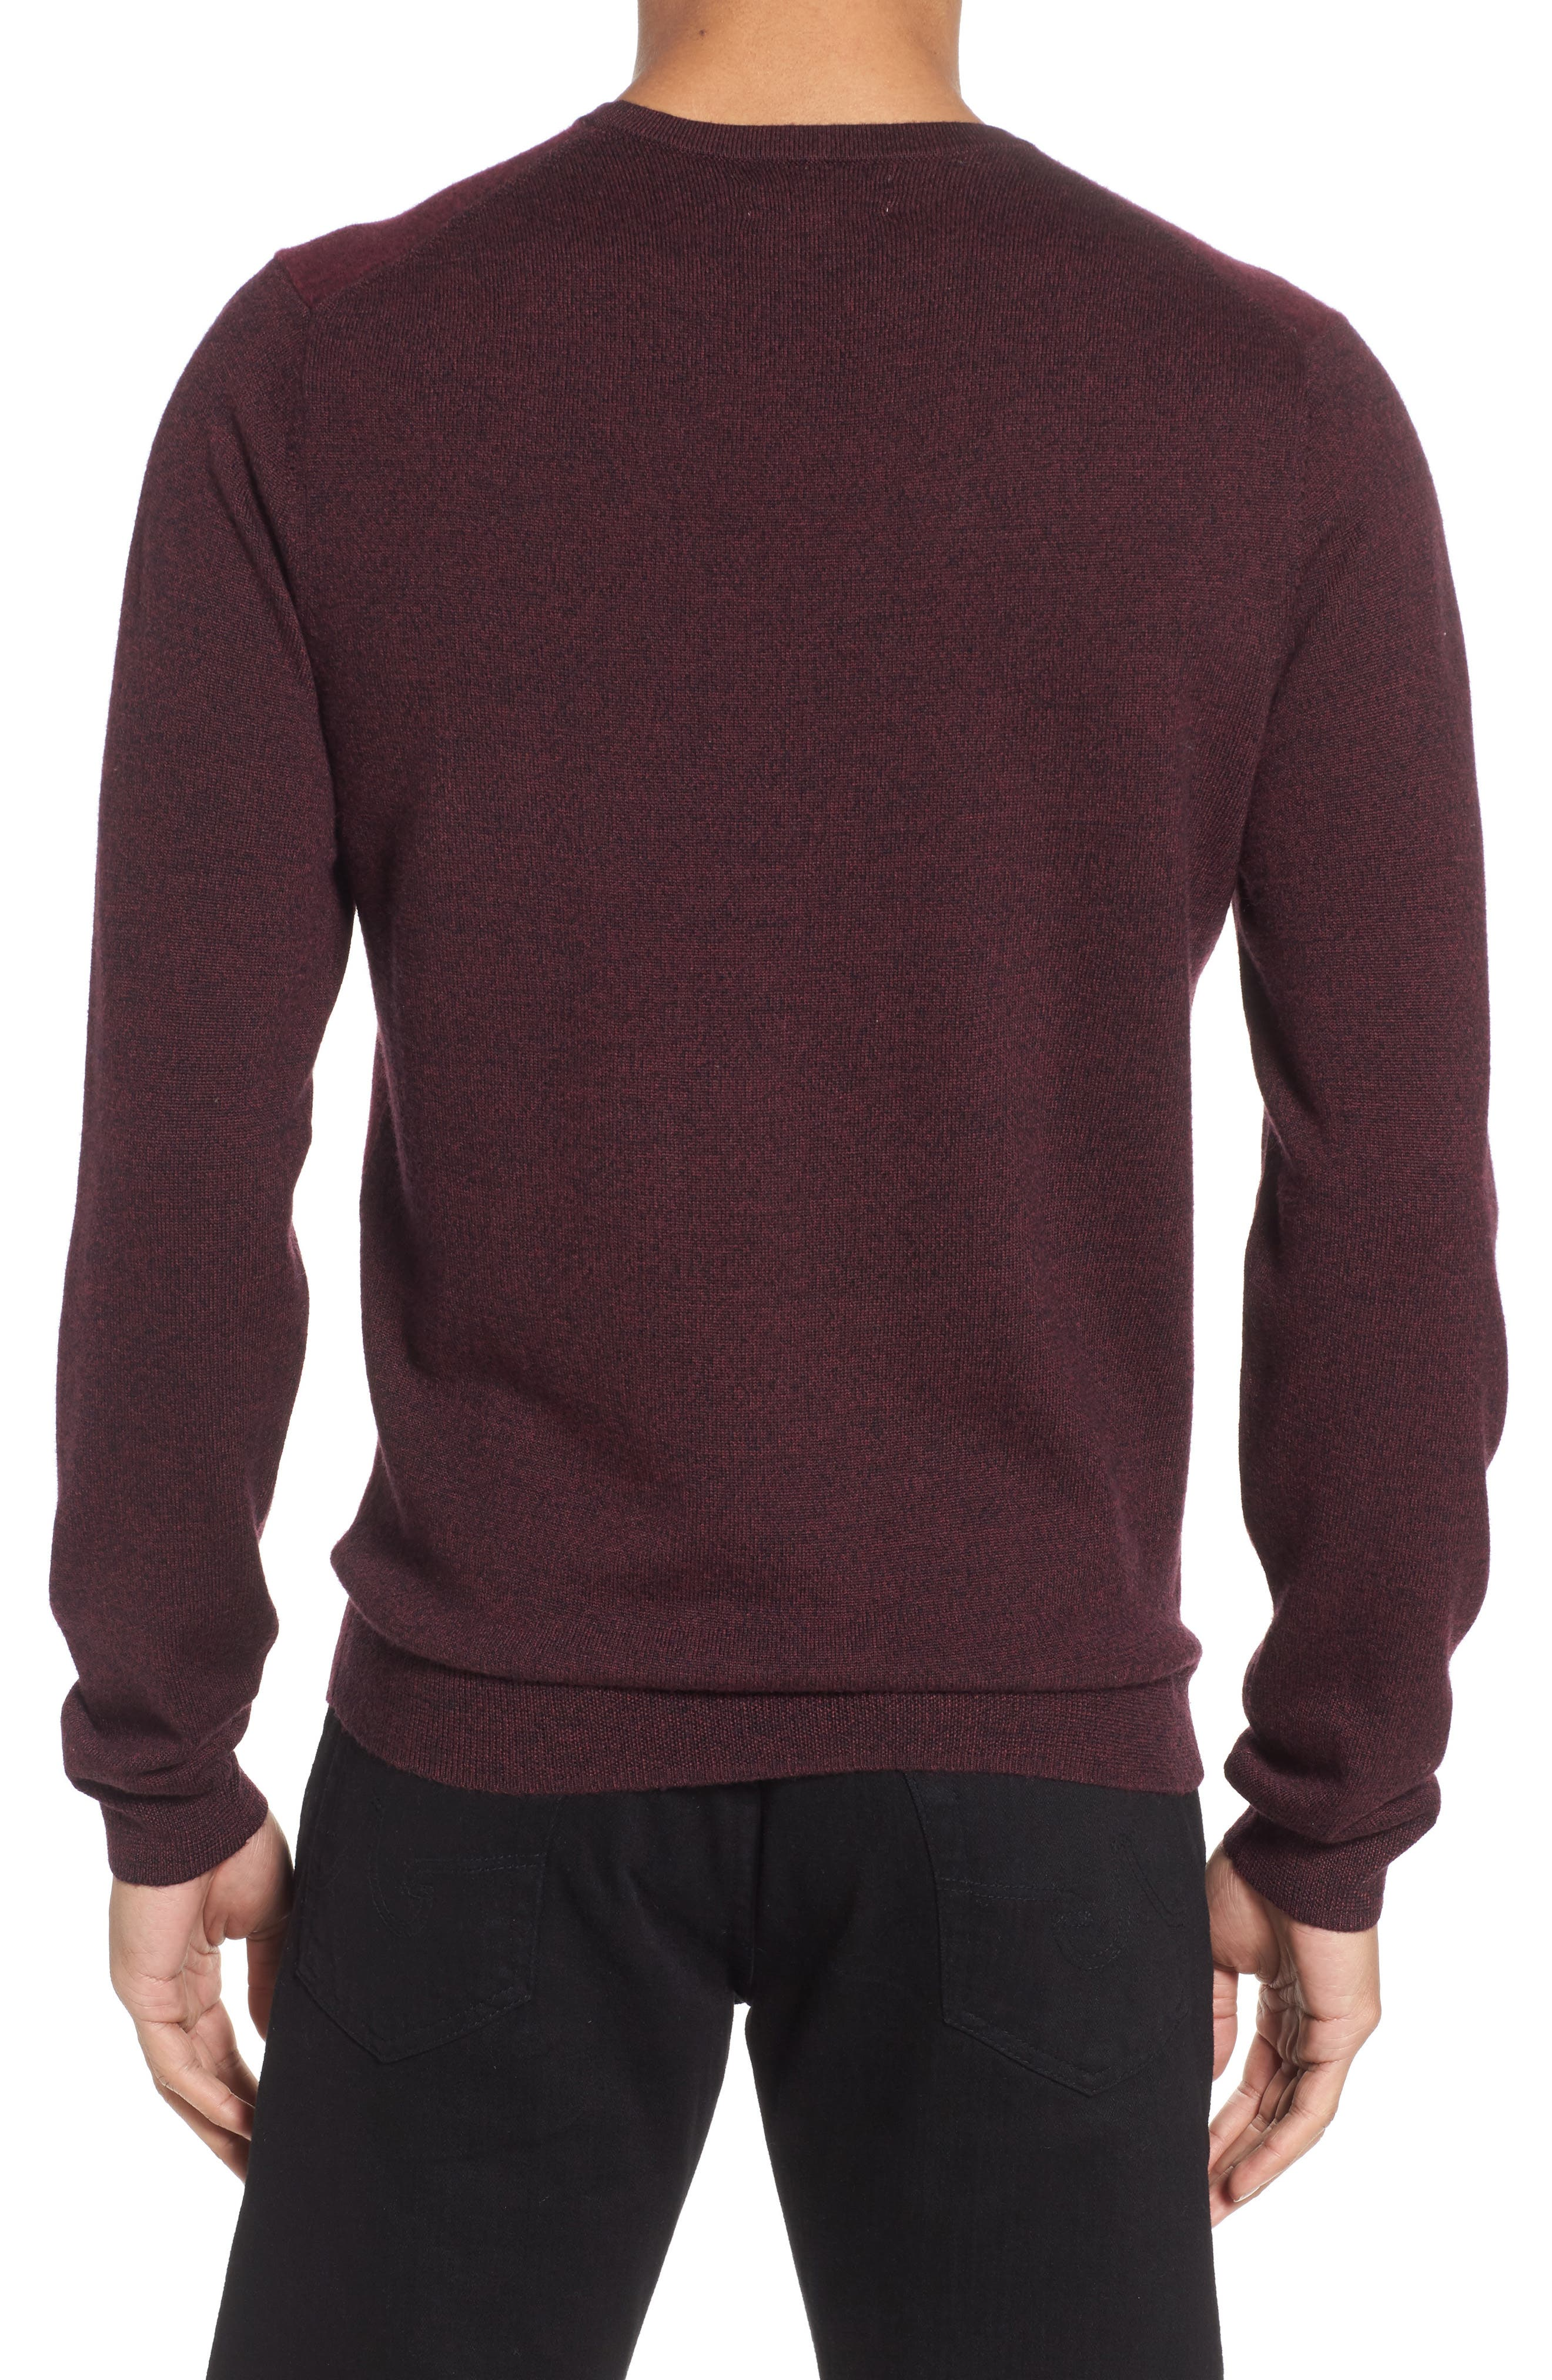 Boiled Wool Blend Crewneck Sweater,                             Alternate thumbnail 2, color,                             Burgundy Stem